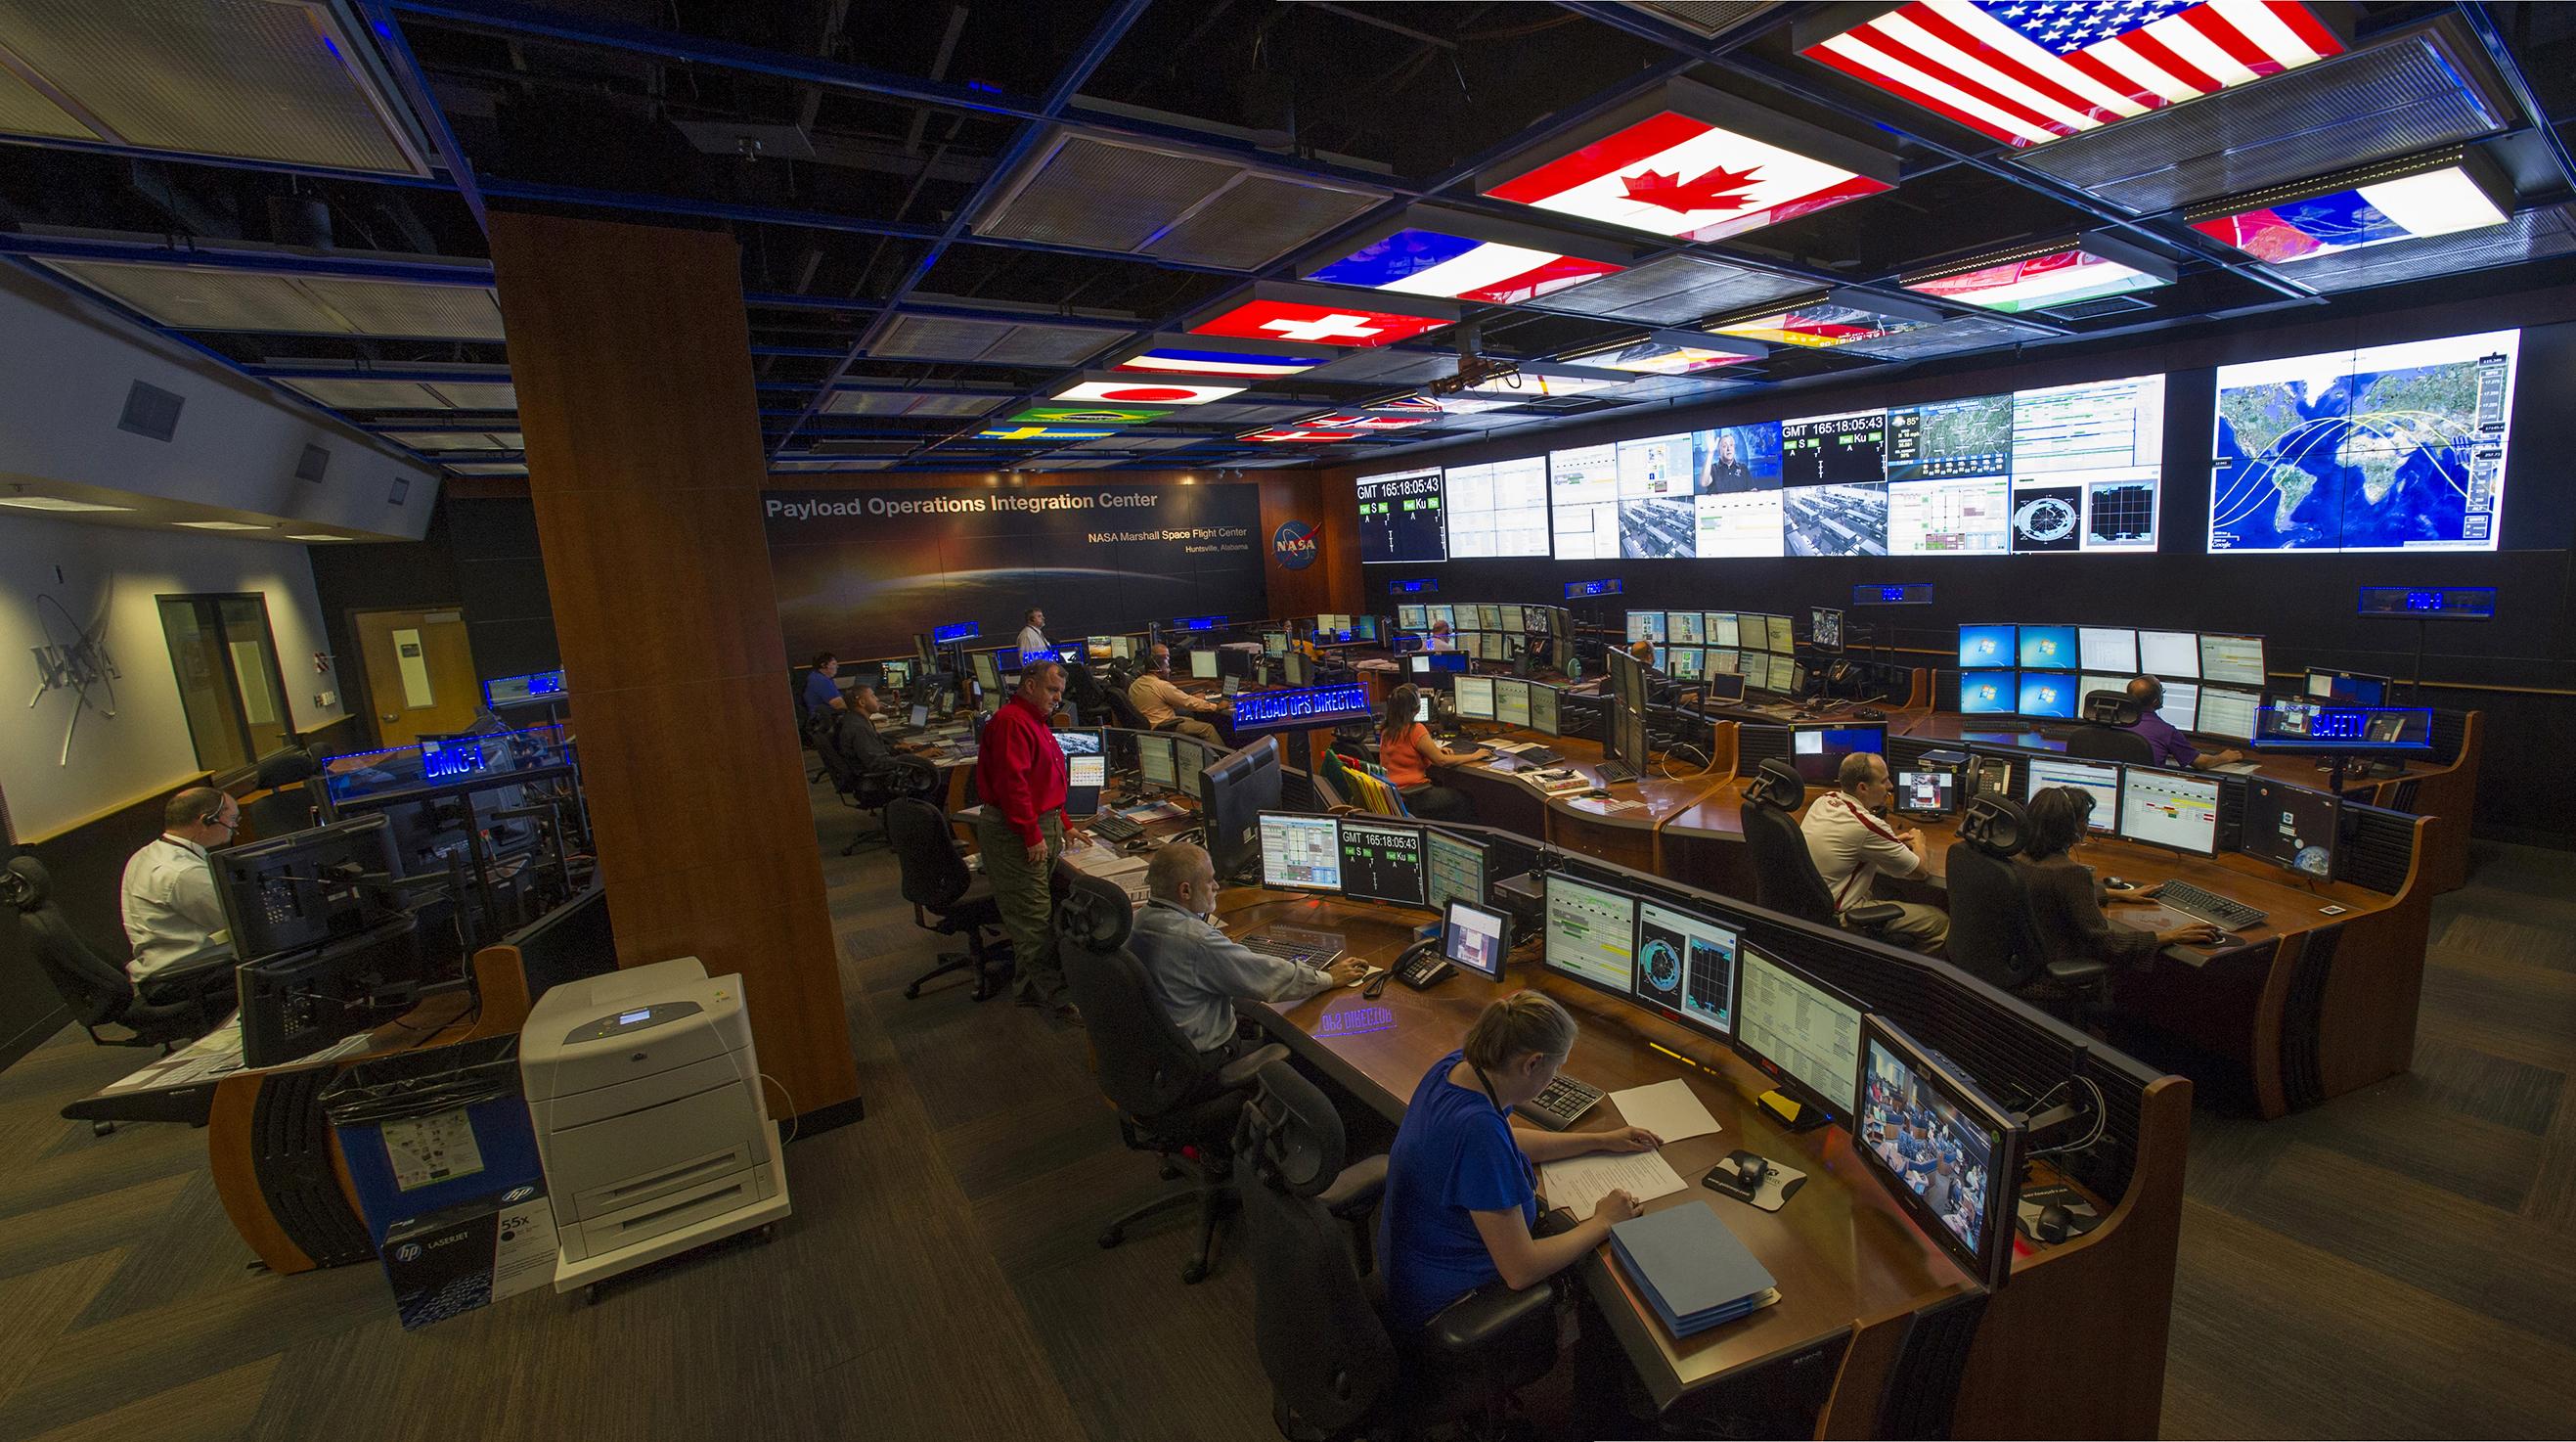 NASA - Marshall Star, June 26, 2013 Edition